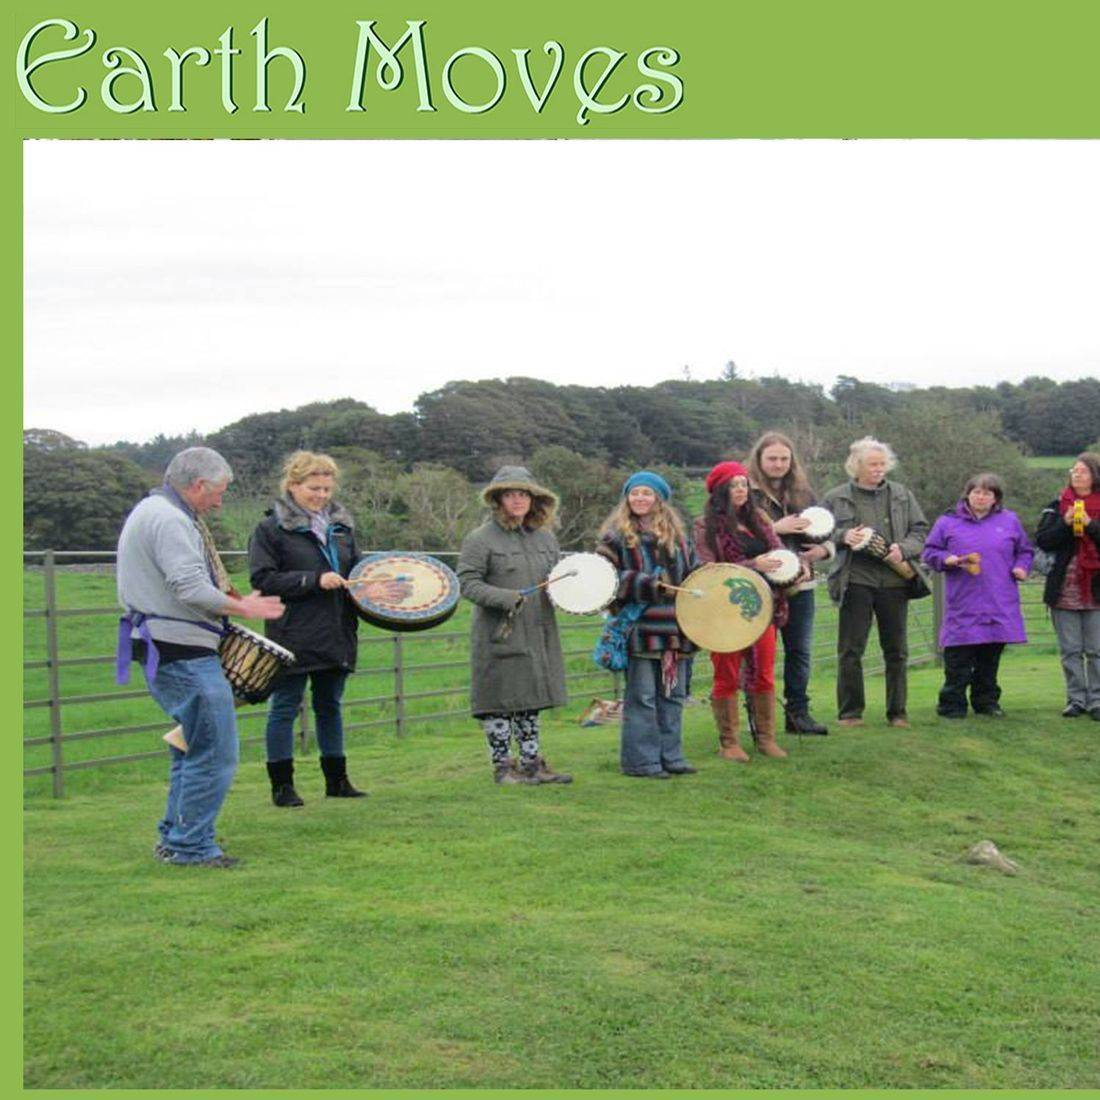 Earthmoves Wales drumming circle rhythm sacred meditative